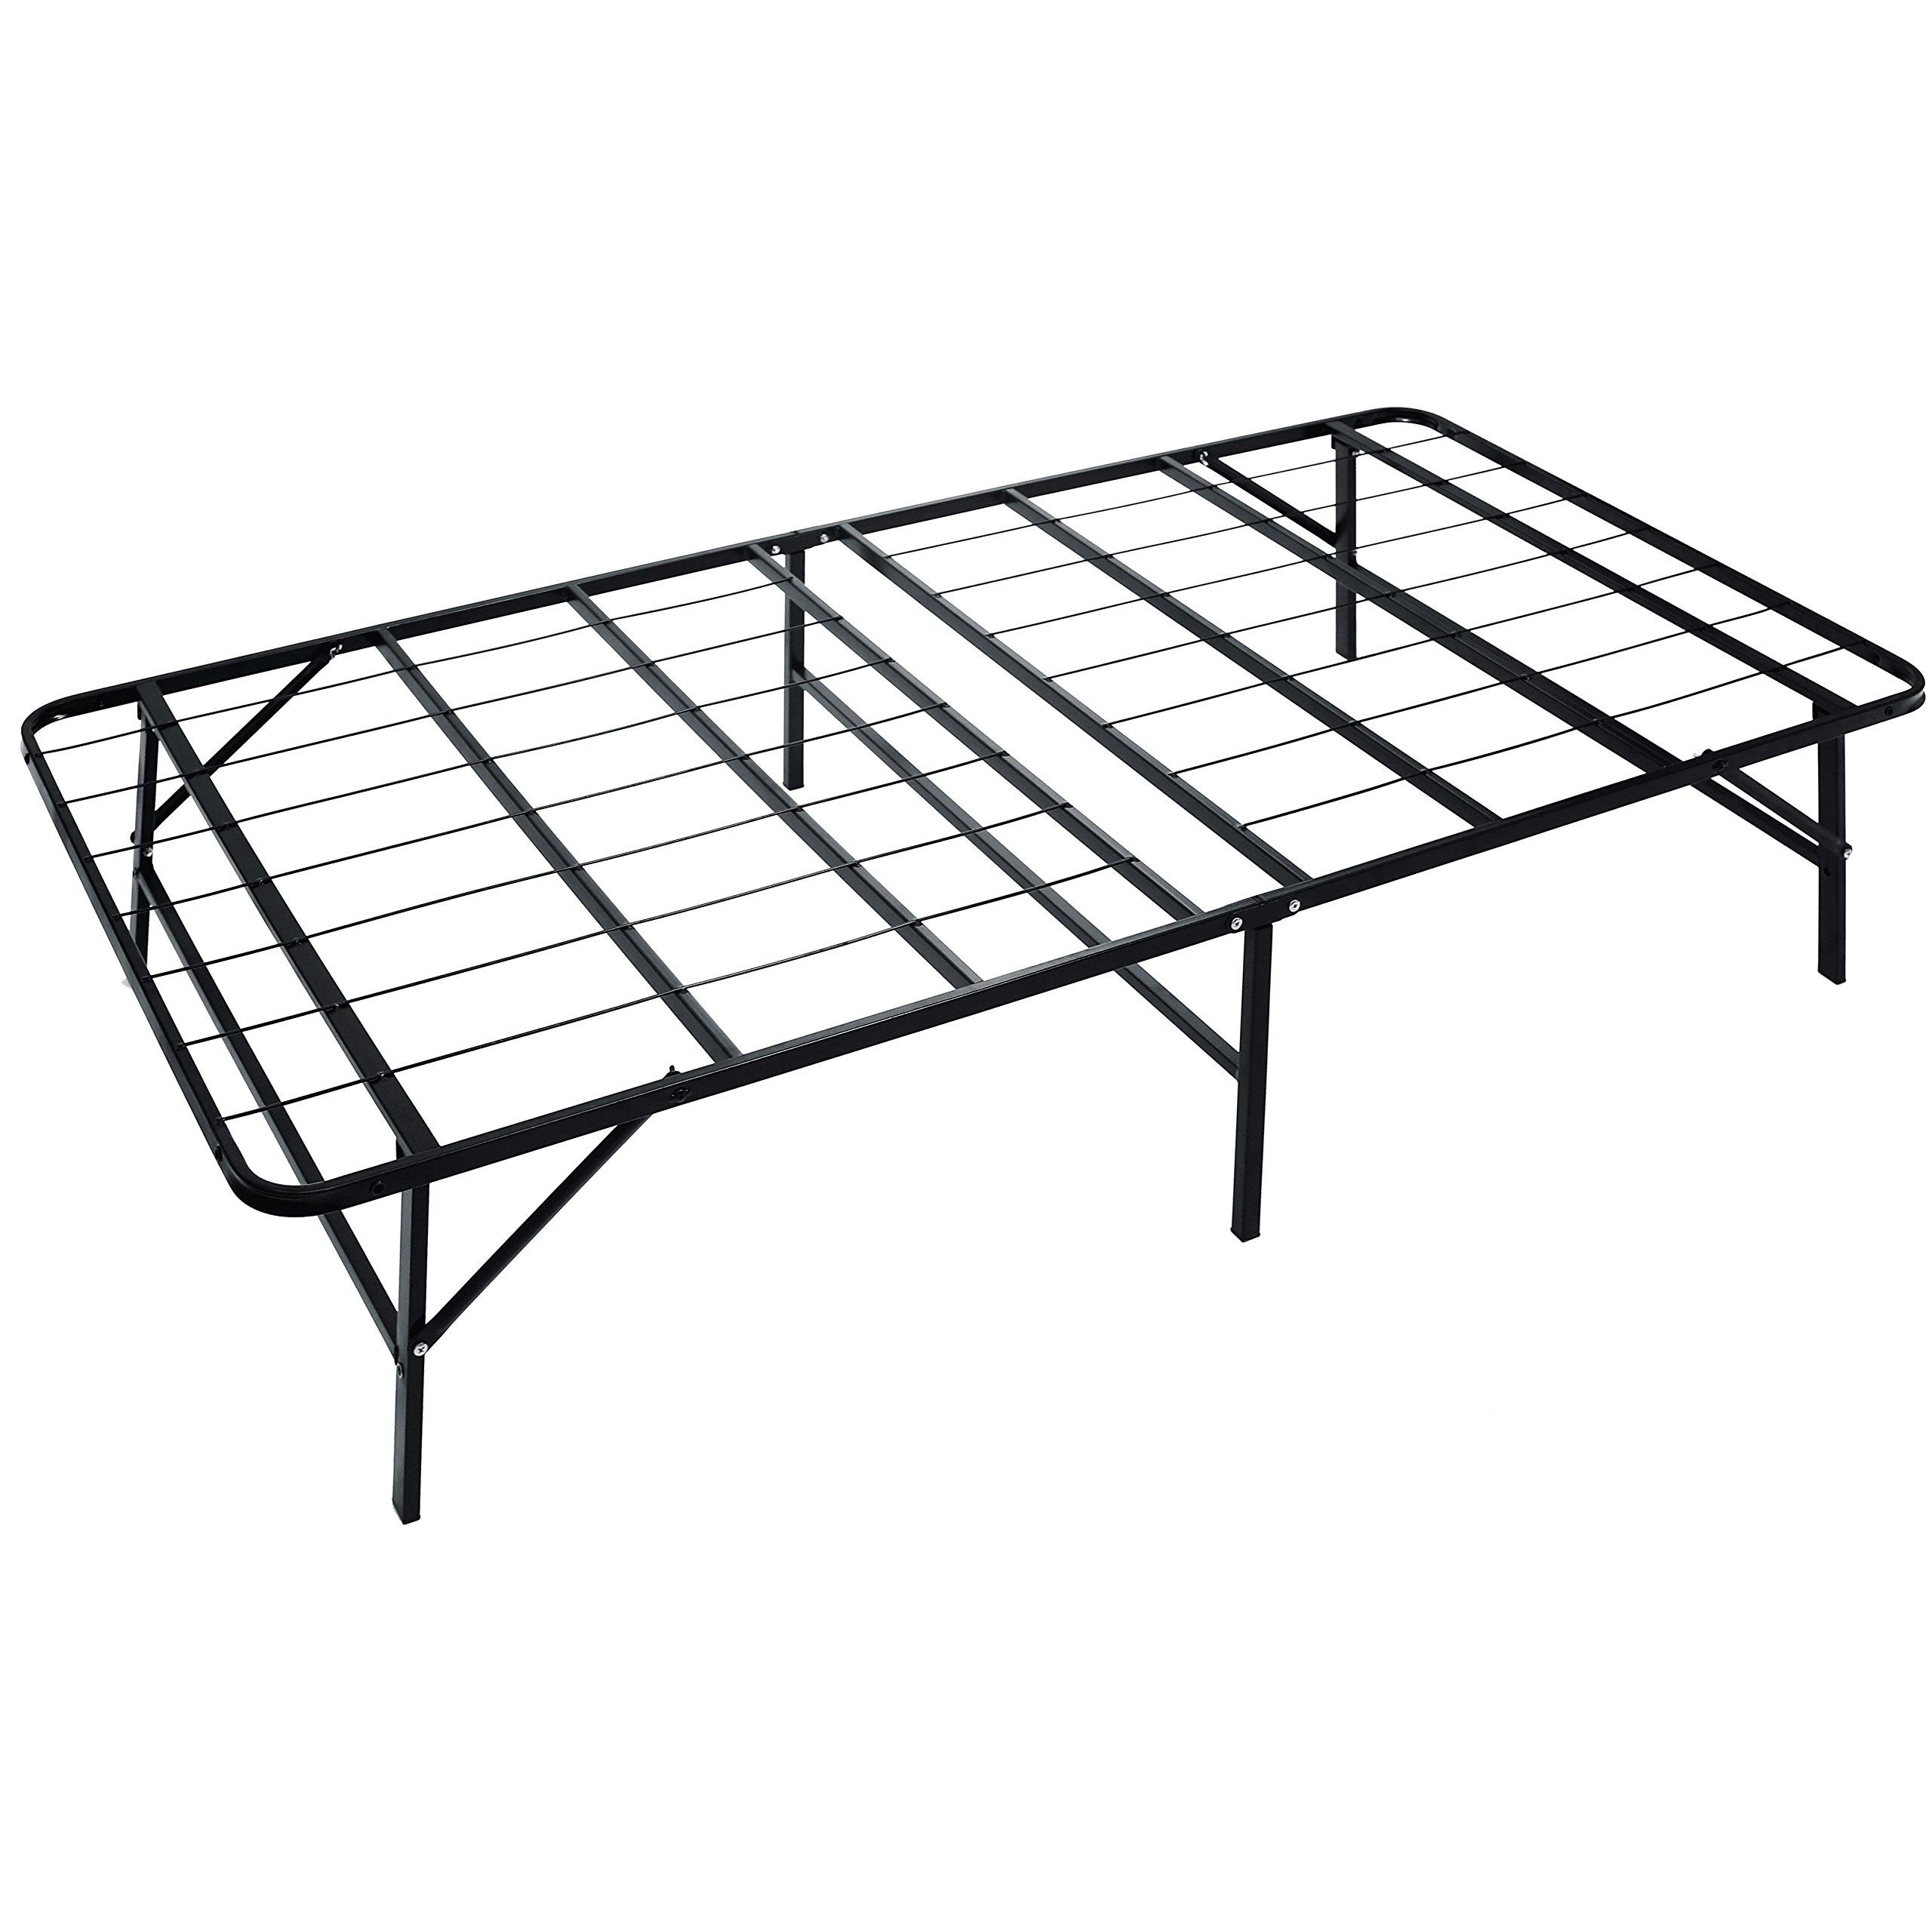 Naomi Home idealBase Heavy-Duty Noise-Free 14 Inch Platform Bed Twin XL/Black